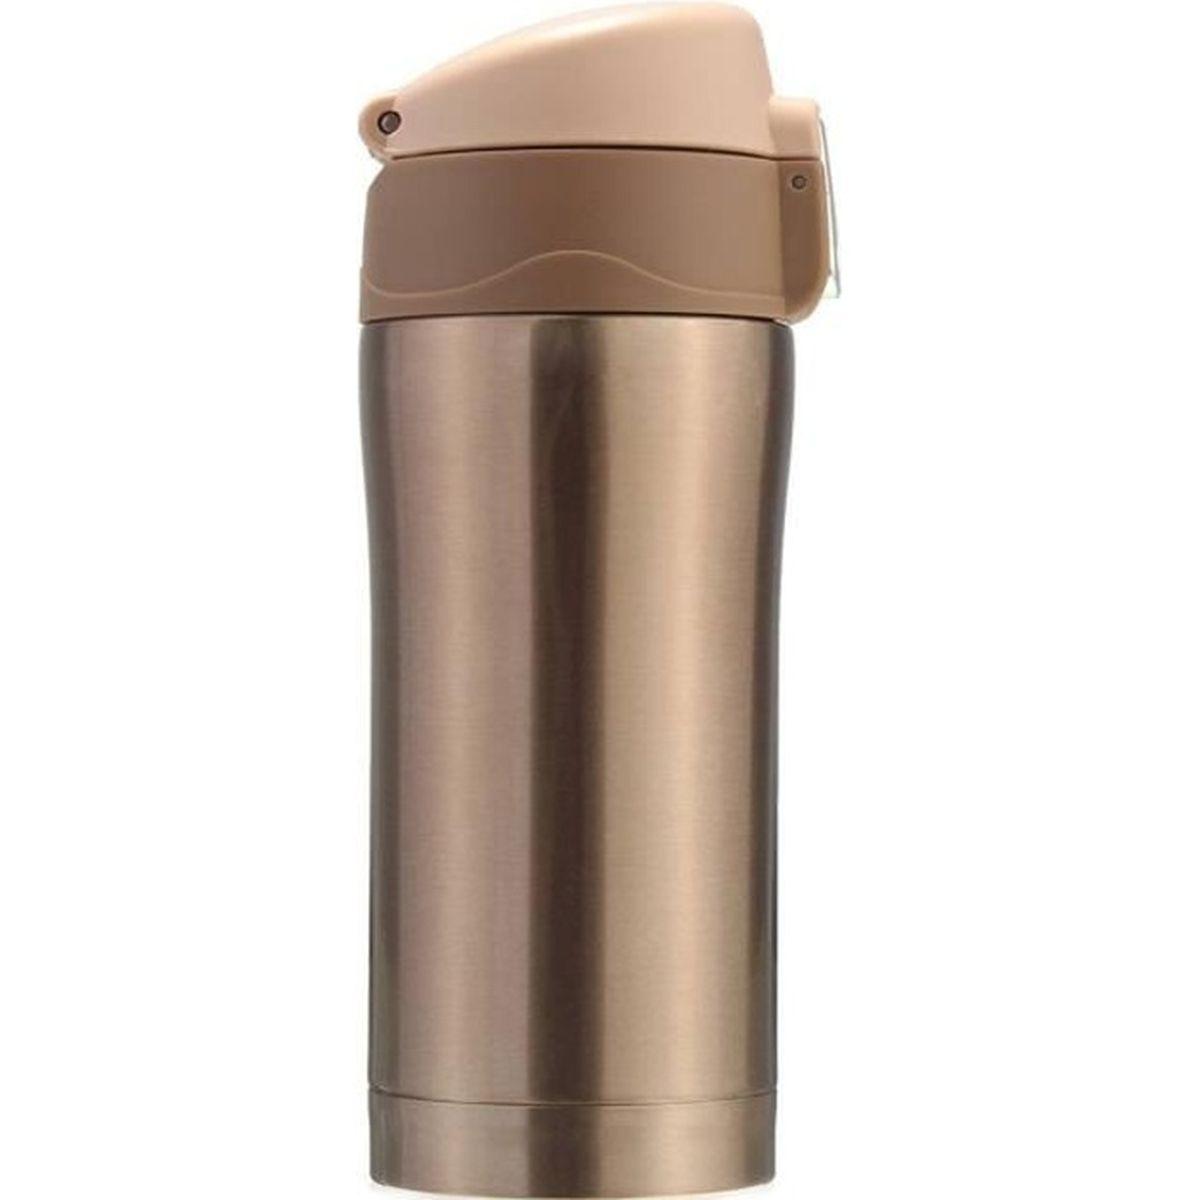 thermos tasse a cafe mug achat vente thermos tasse a cafe mug pas cher les soldes sur. Black Bedroom Furniture Sets. Home Design Ideas